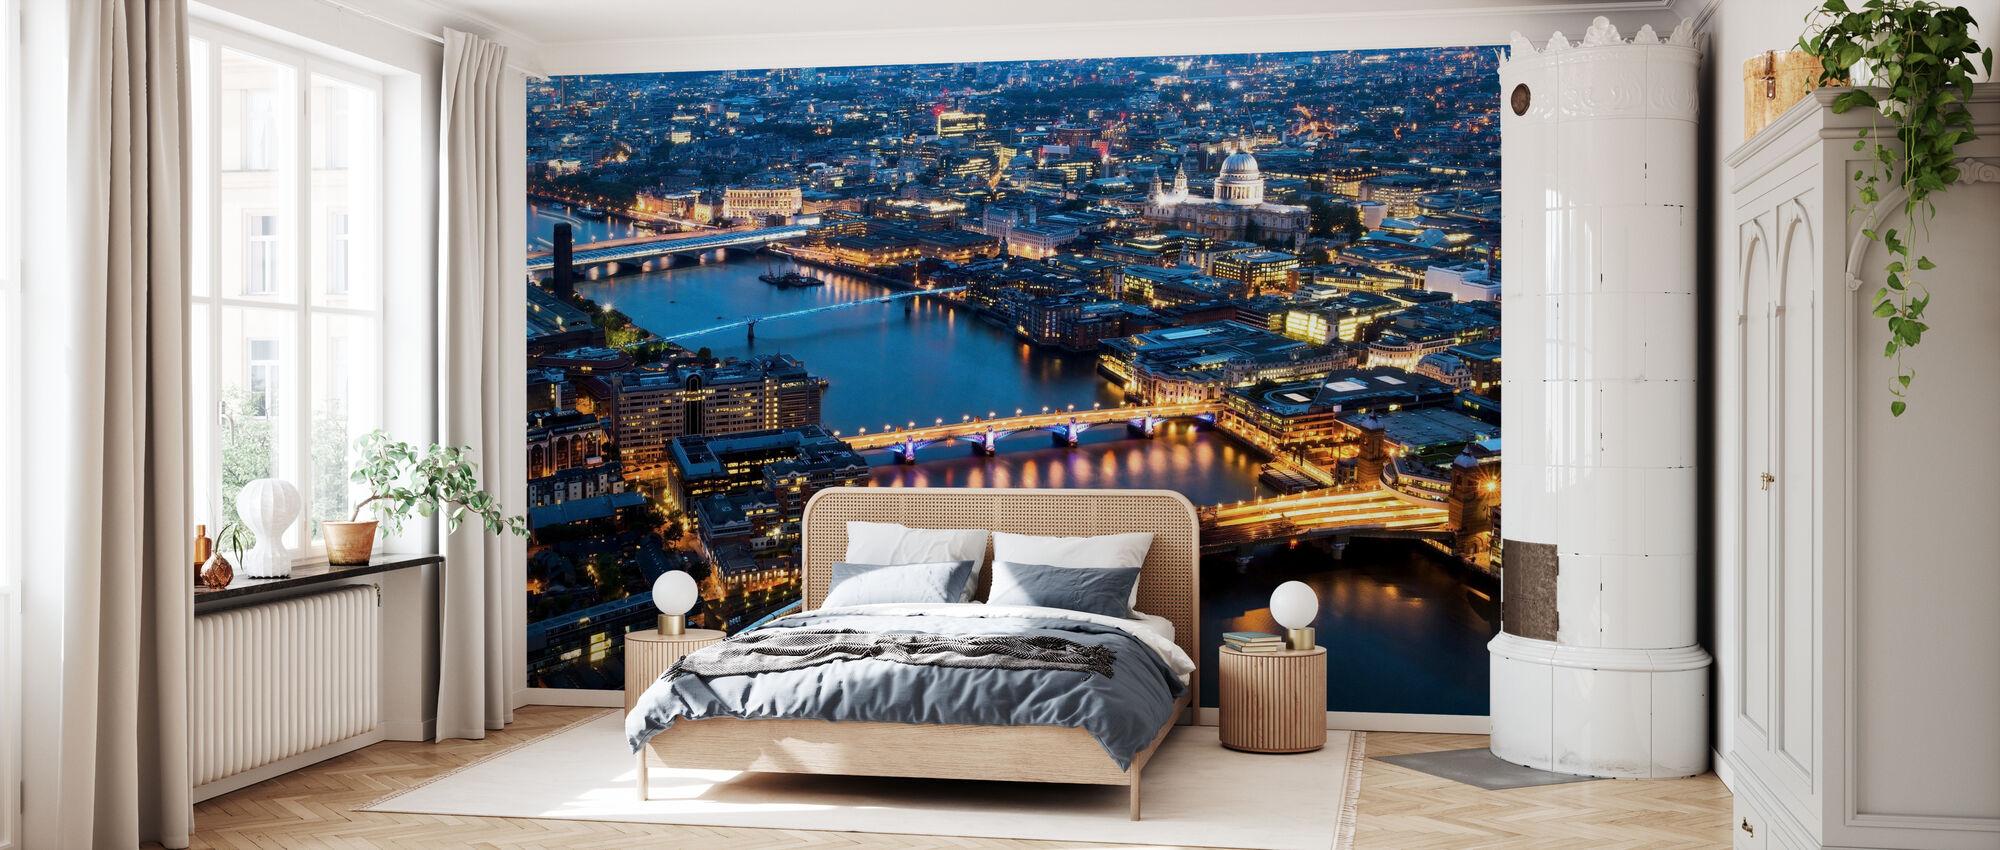 London by night - Wallpaper - Bedroom